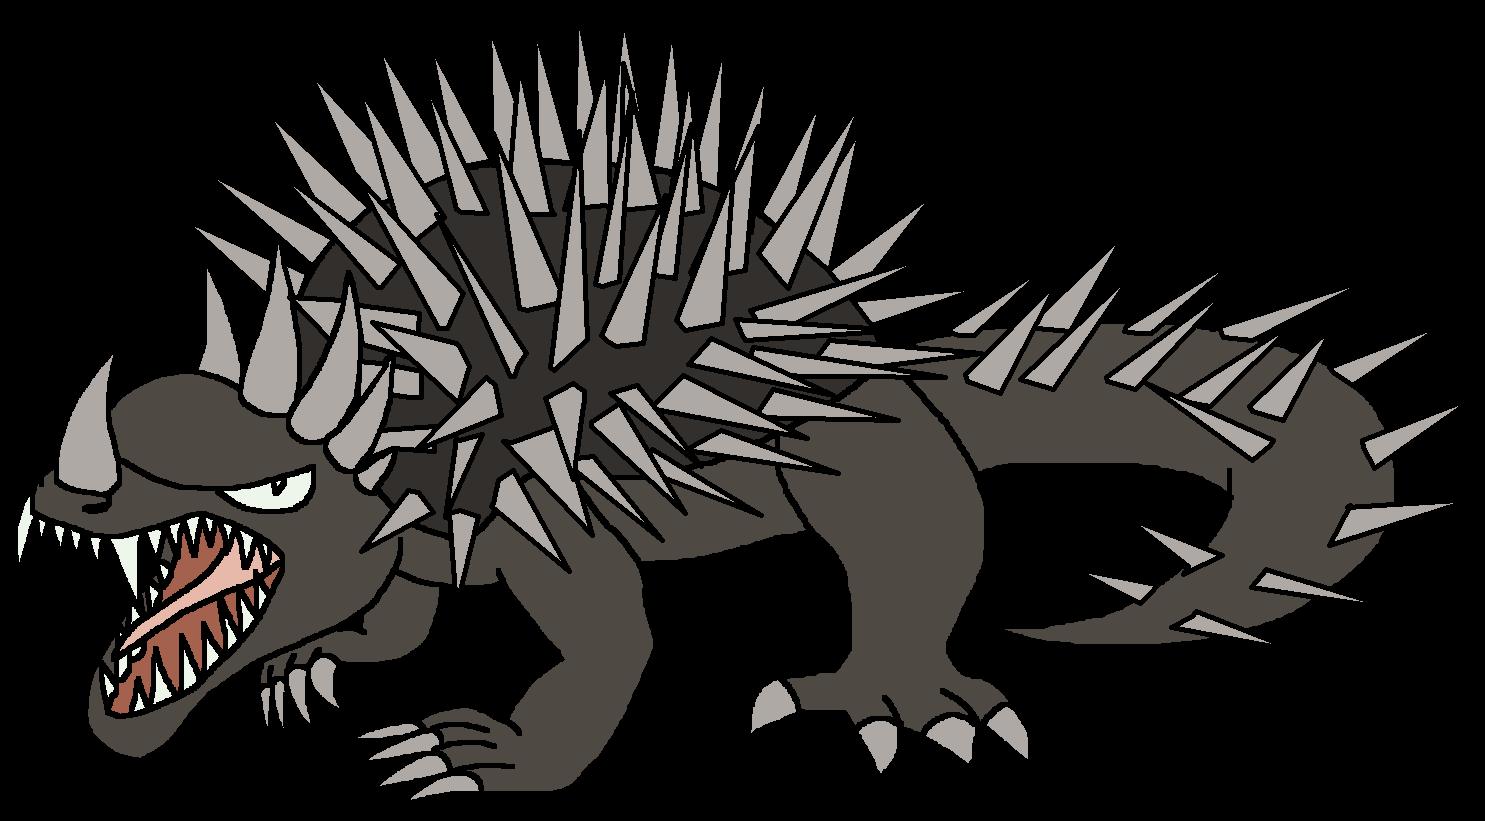 Godzilla - Combat of Gargantuan Monsters/Action Mode with Monsters